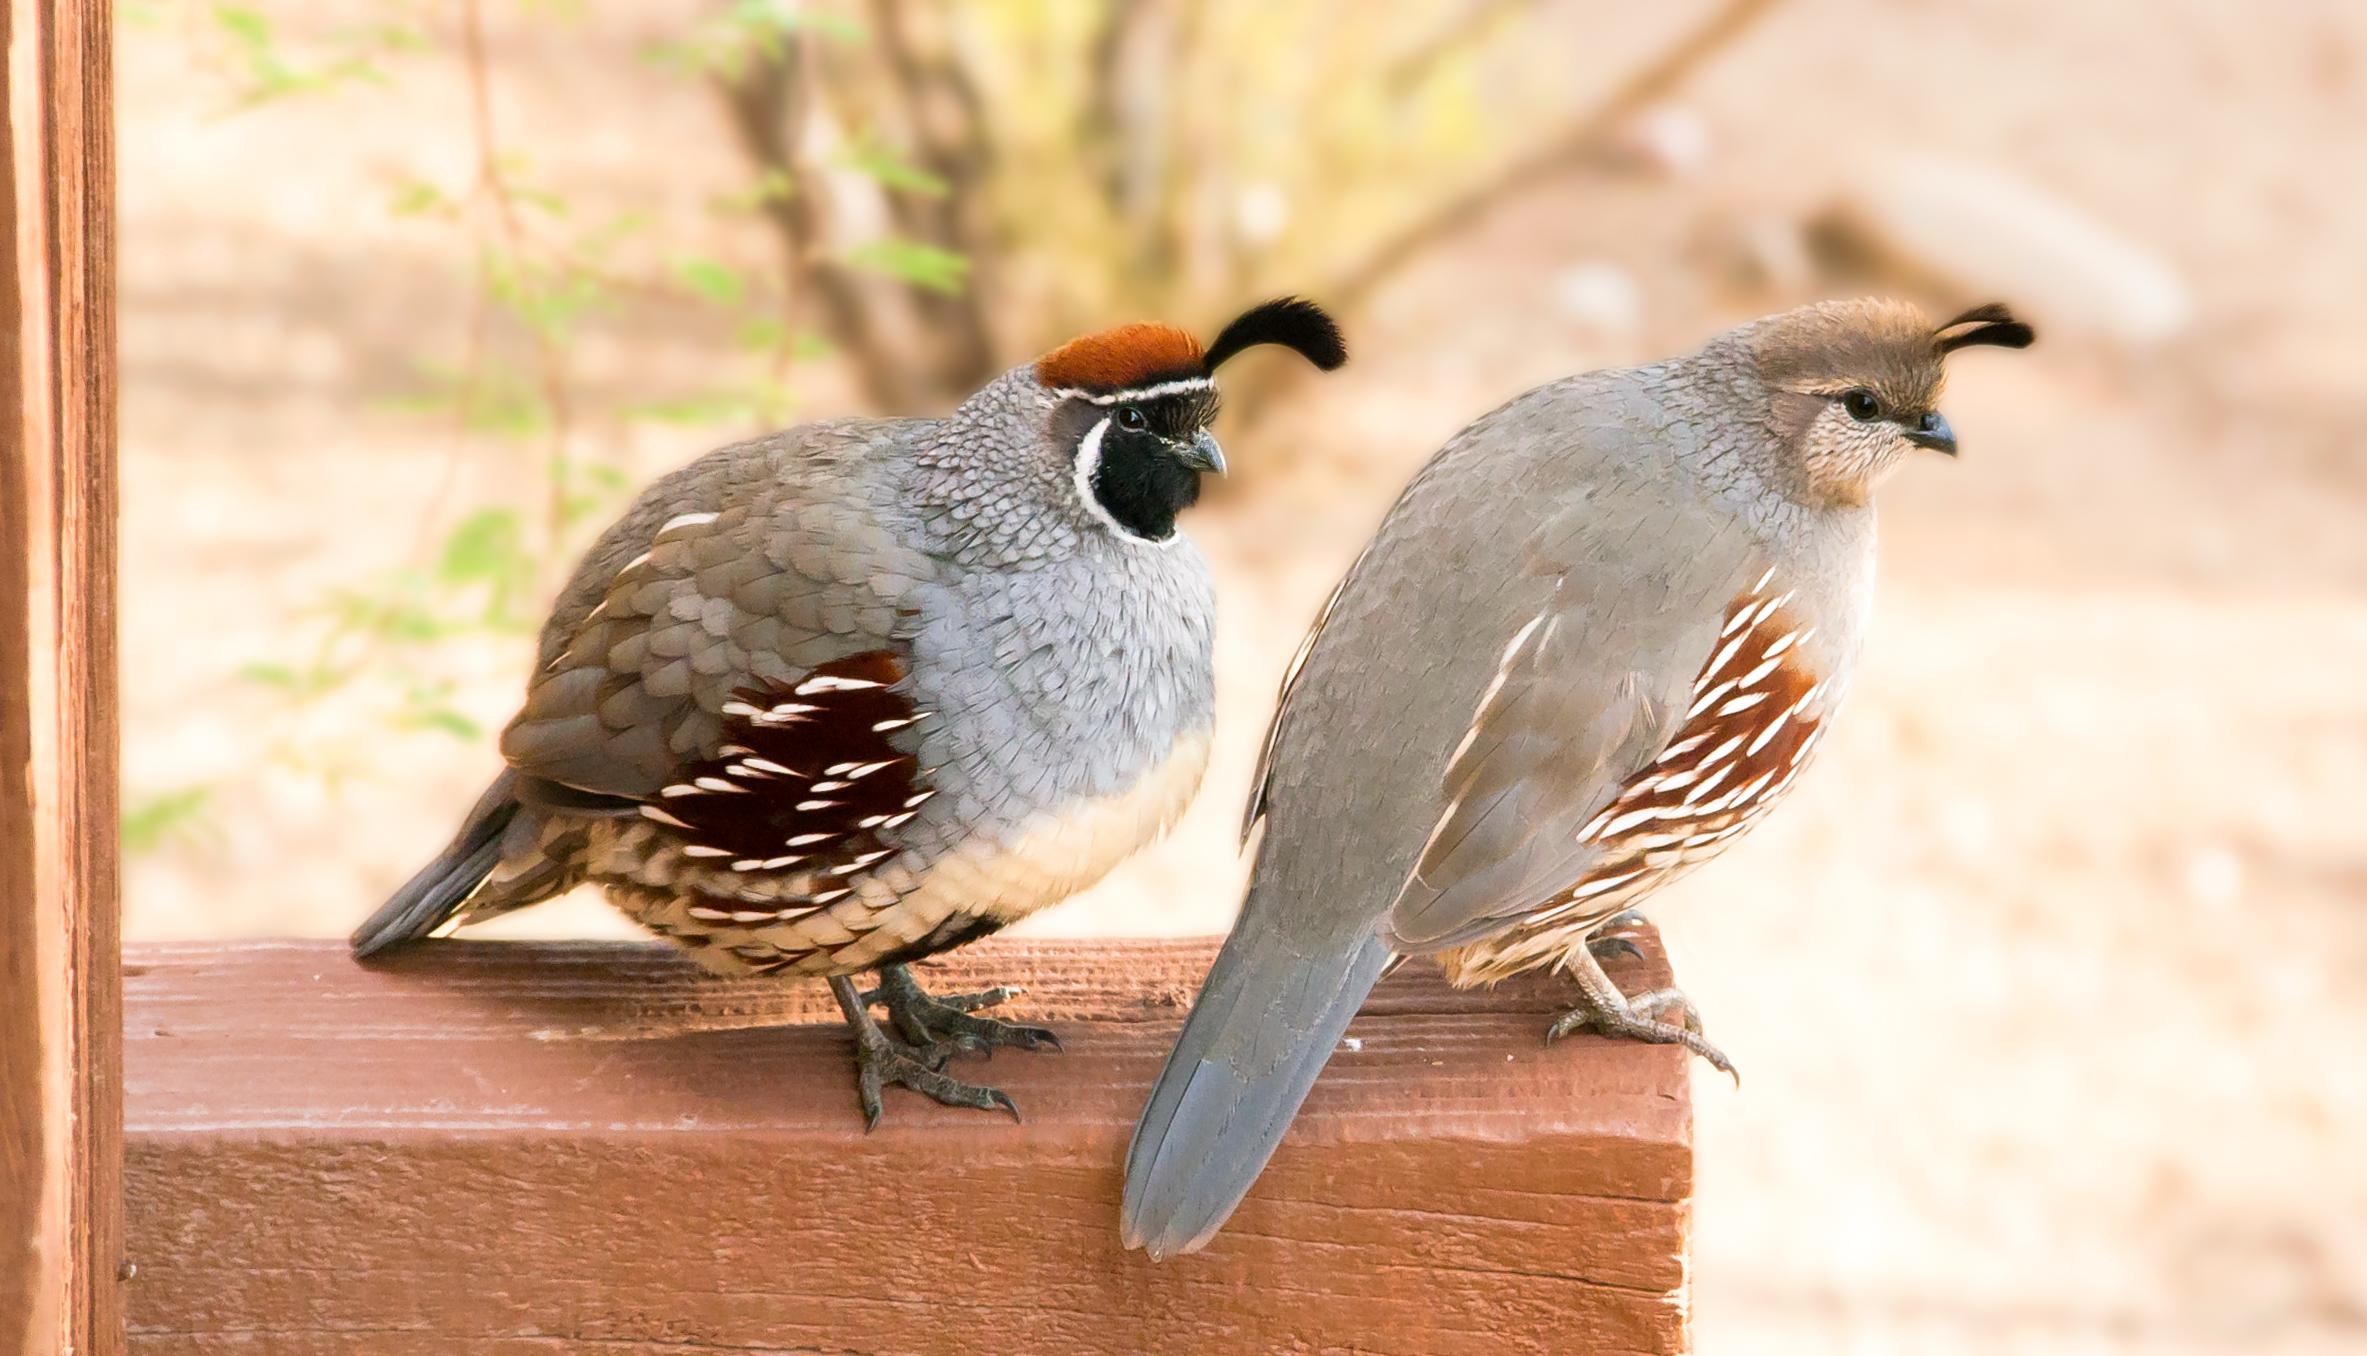 free images : nature, cute, wildlife, beak, couple, two, fauna